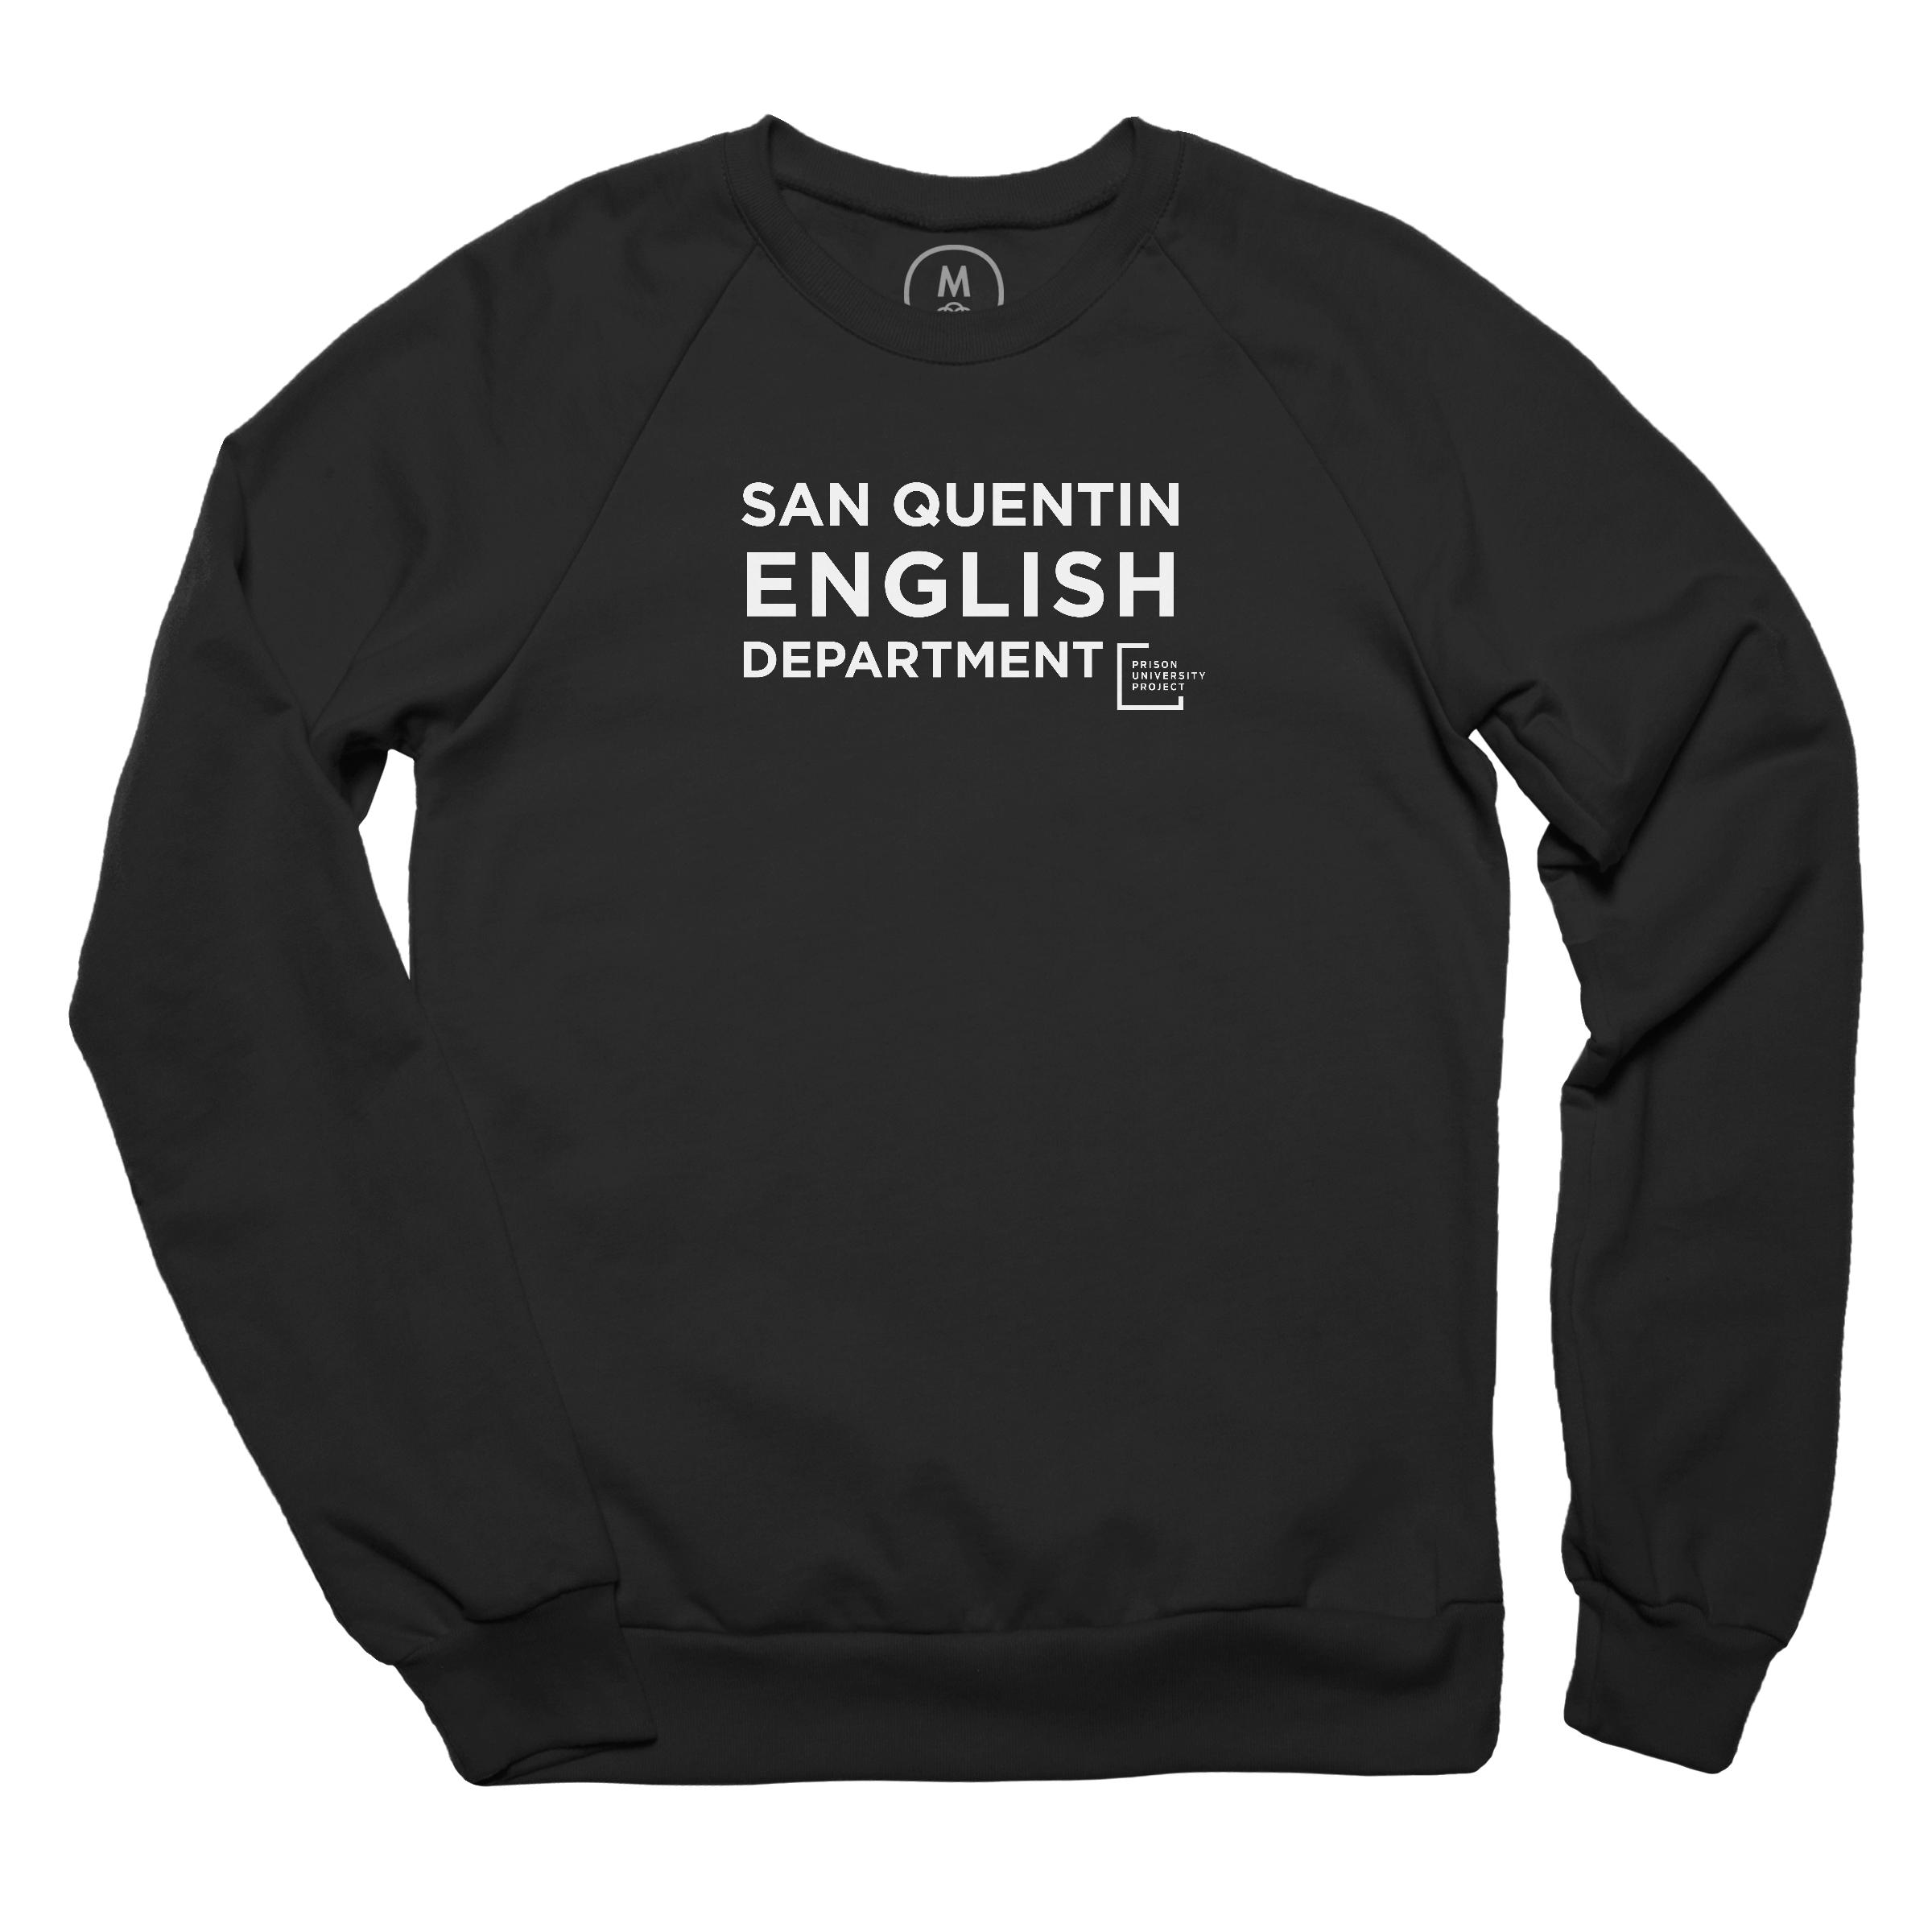 San Quentin English Department Pullover Crewneck